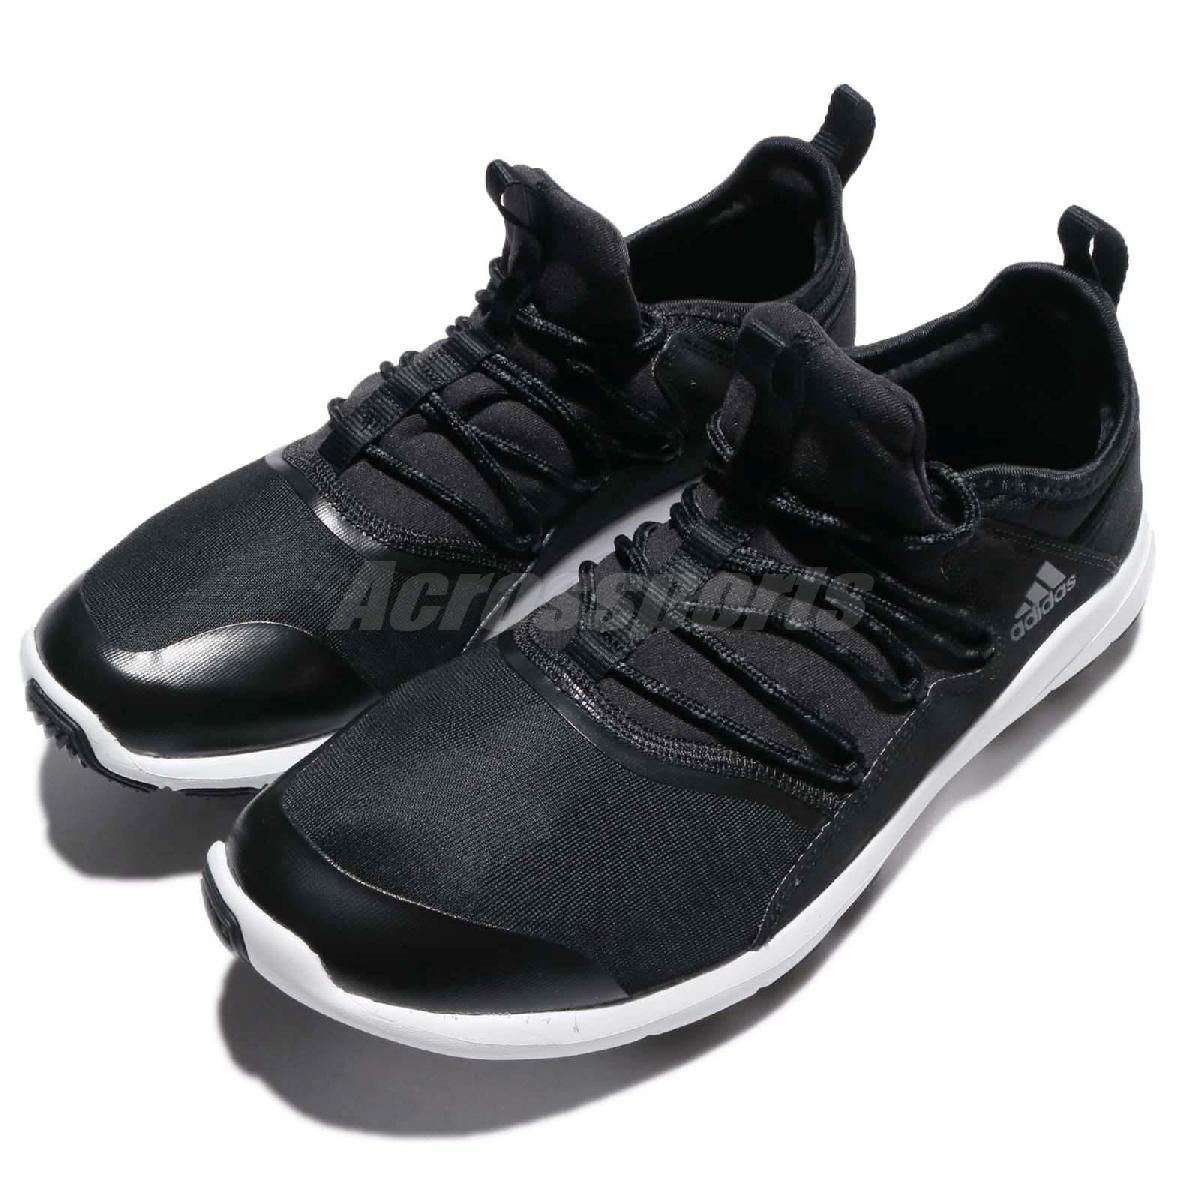 adidas 訓練鞋 CrazyMove TR M 黑白 低筒 健身專用 男鞋 運動鞋 【PUMP306】 BA8027